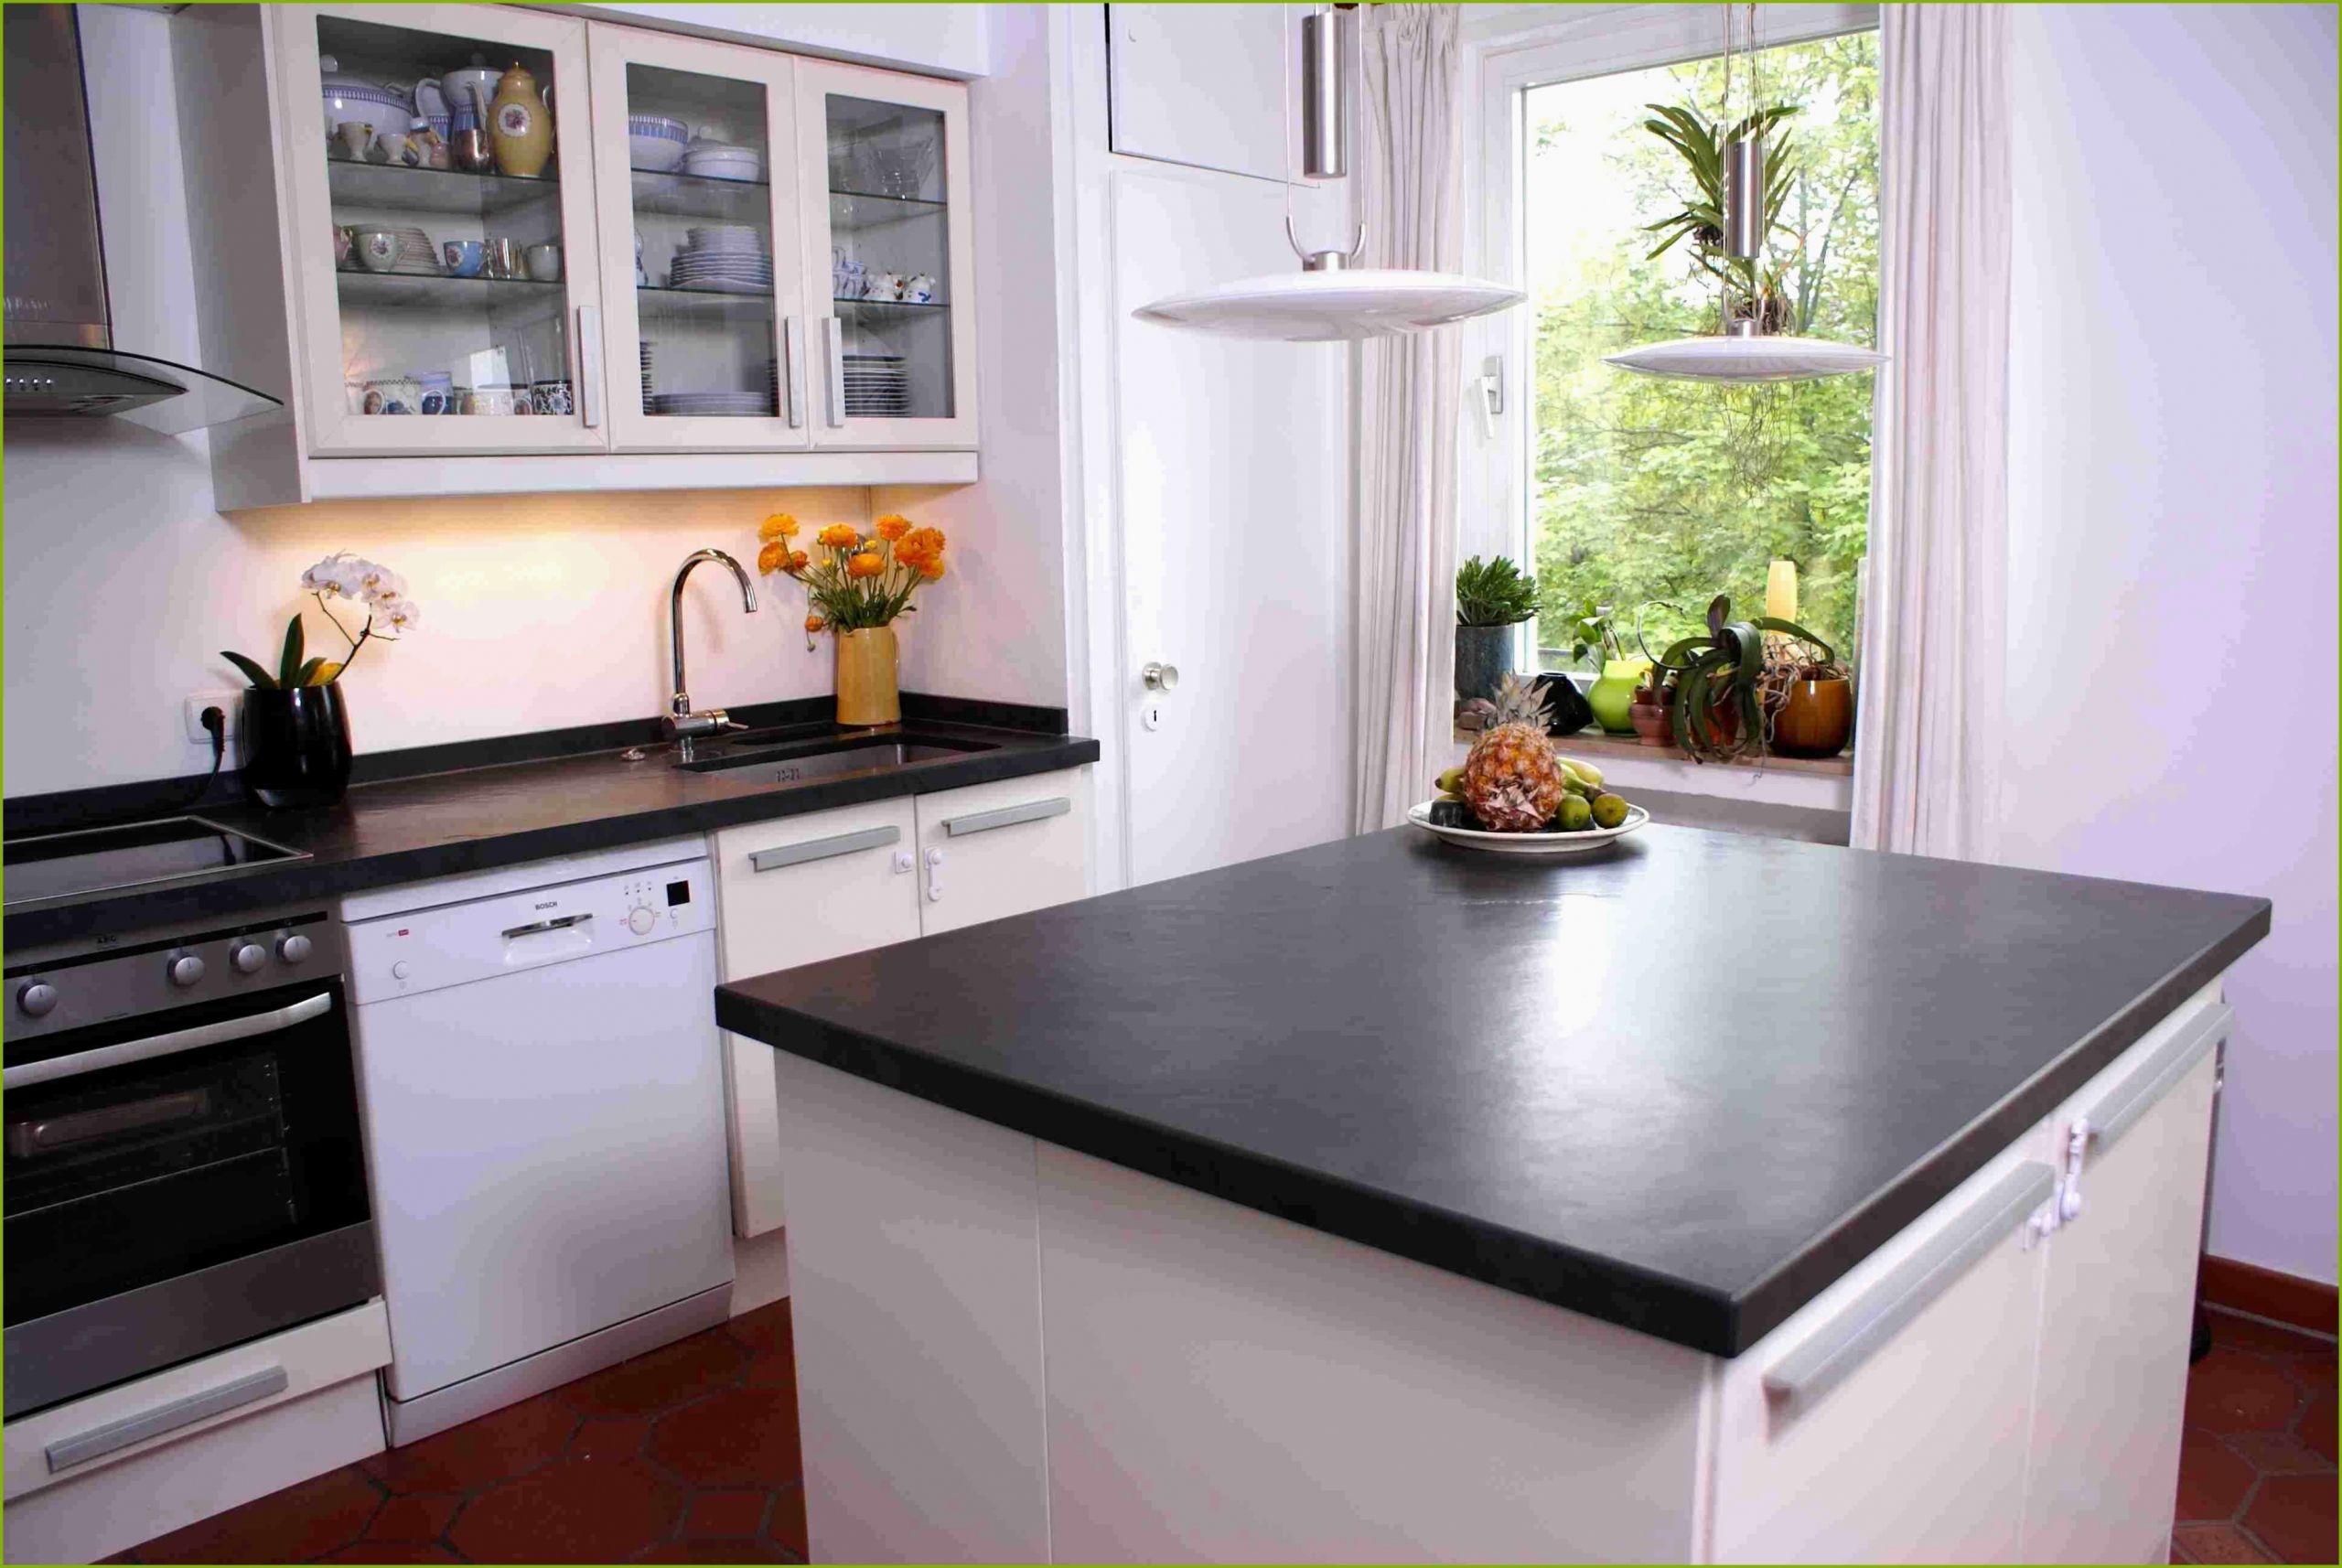 45 luxus deko ideen kuche galerie kuchen fur dachgeschosswohnungen kuchen fur dachgeschosswohnungen 2